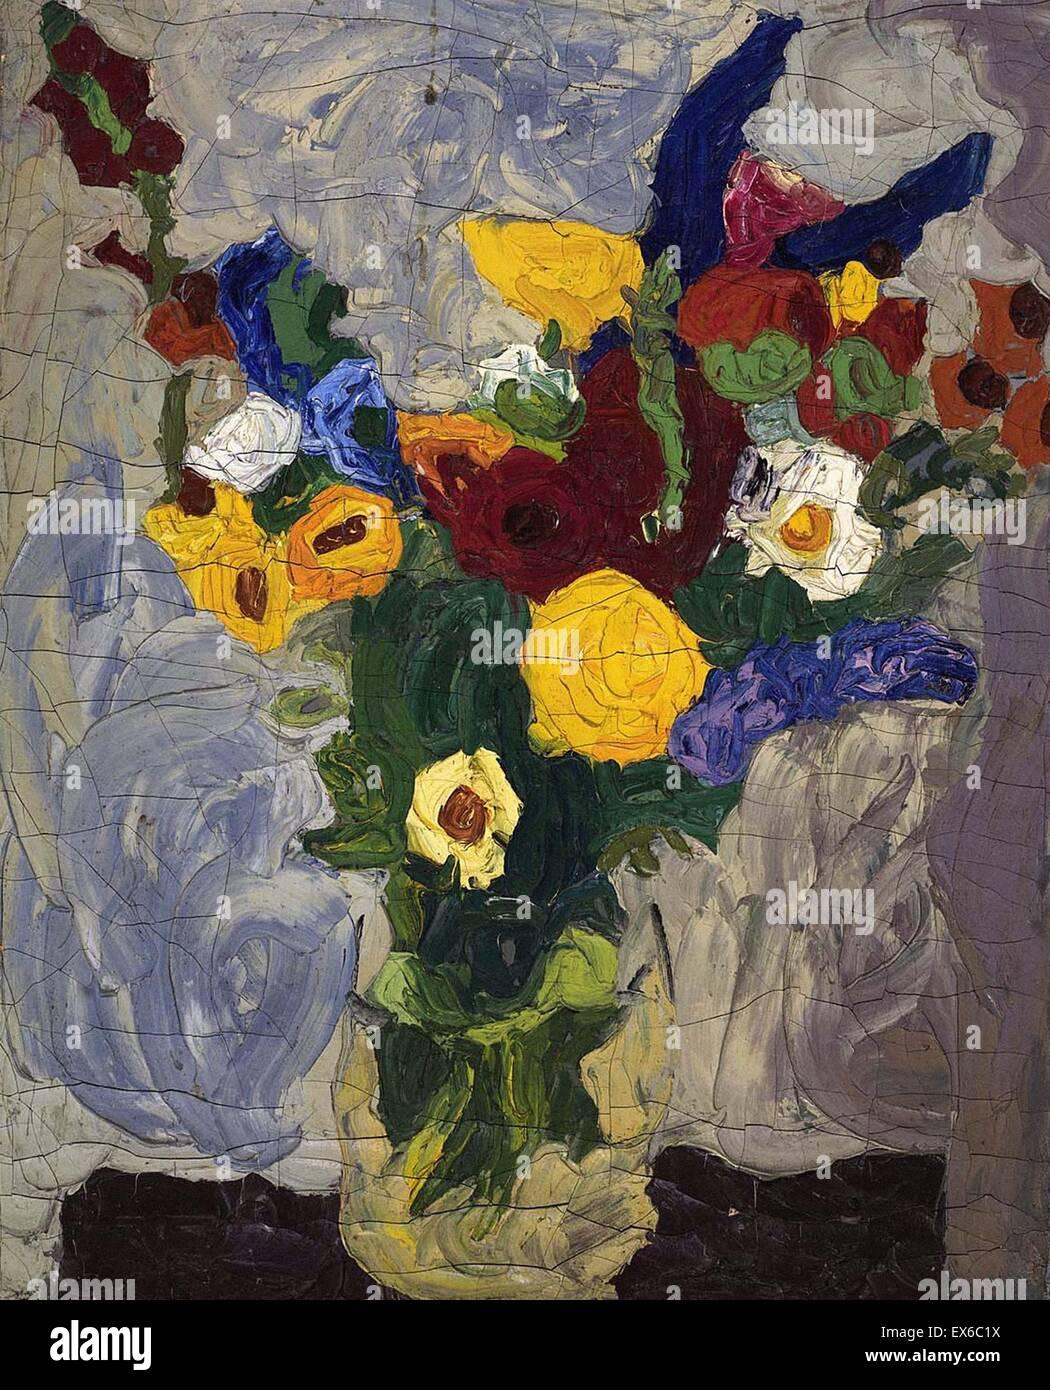 William H. Johnson Bodegón - Bouquet Imagen De Stock